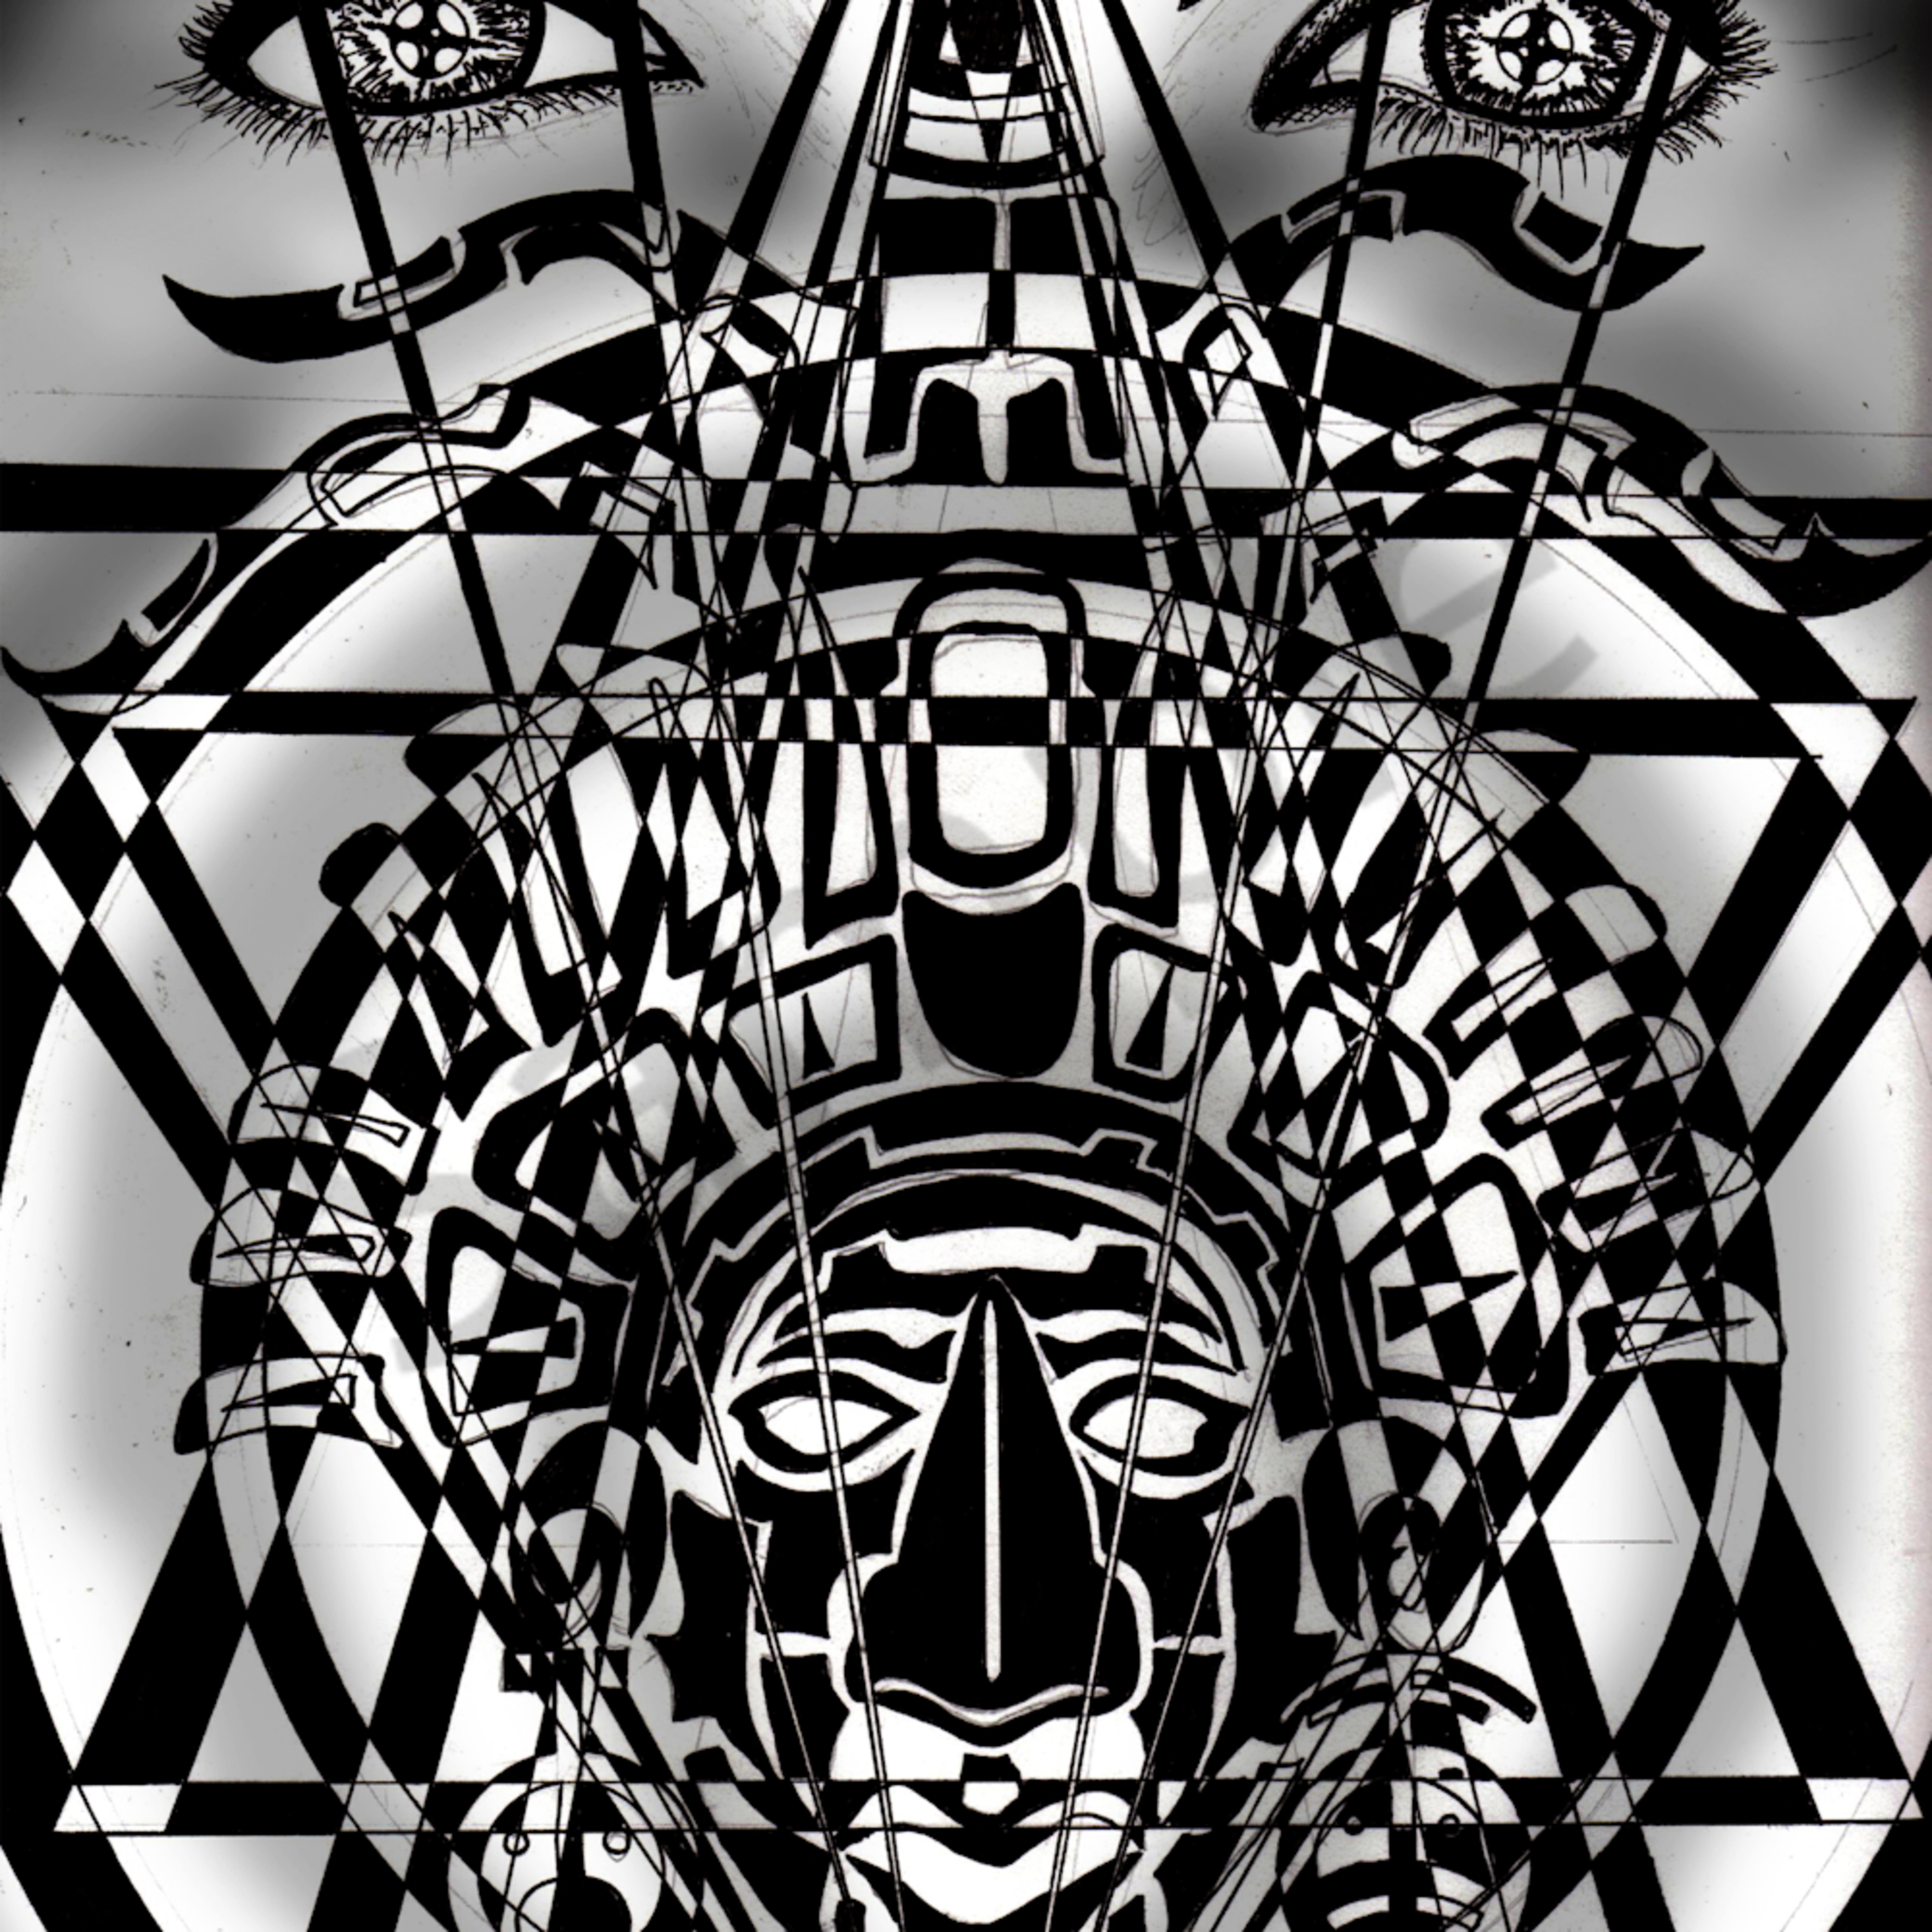 Mayanblacknwhite fvf4vf